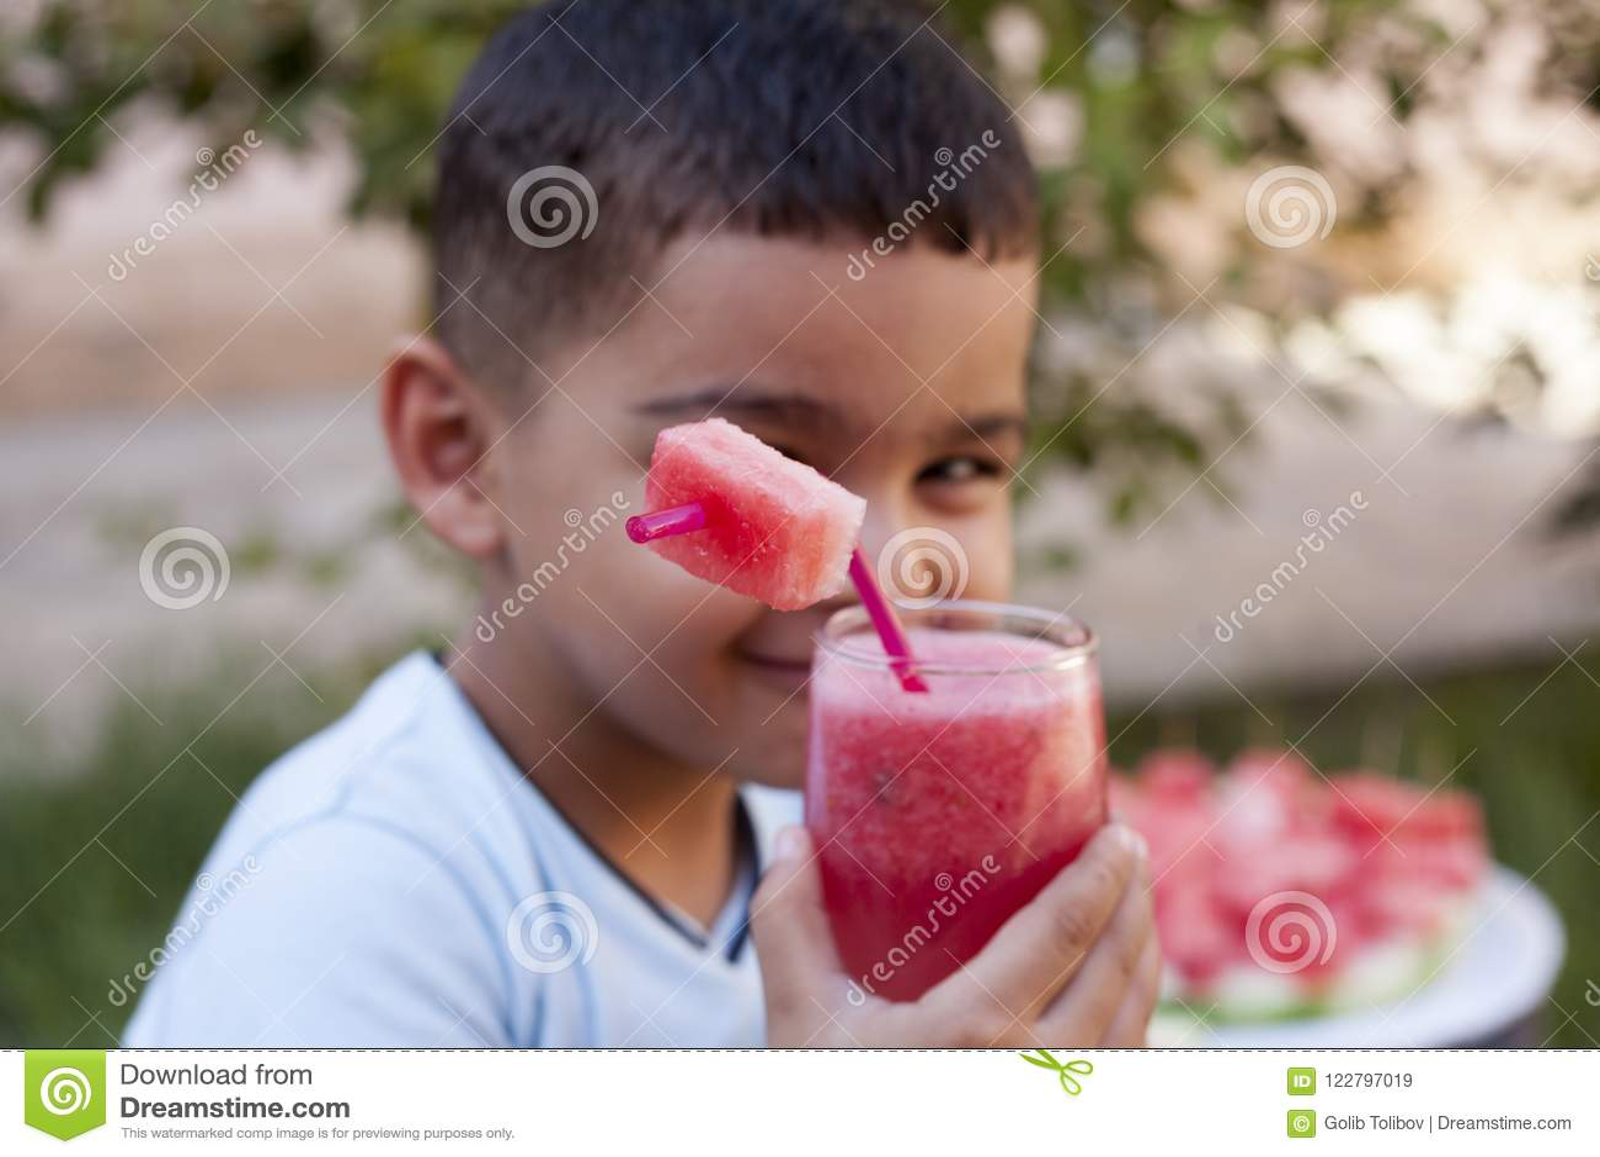 Caucasian boy with watermelon juice